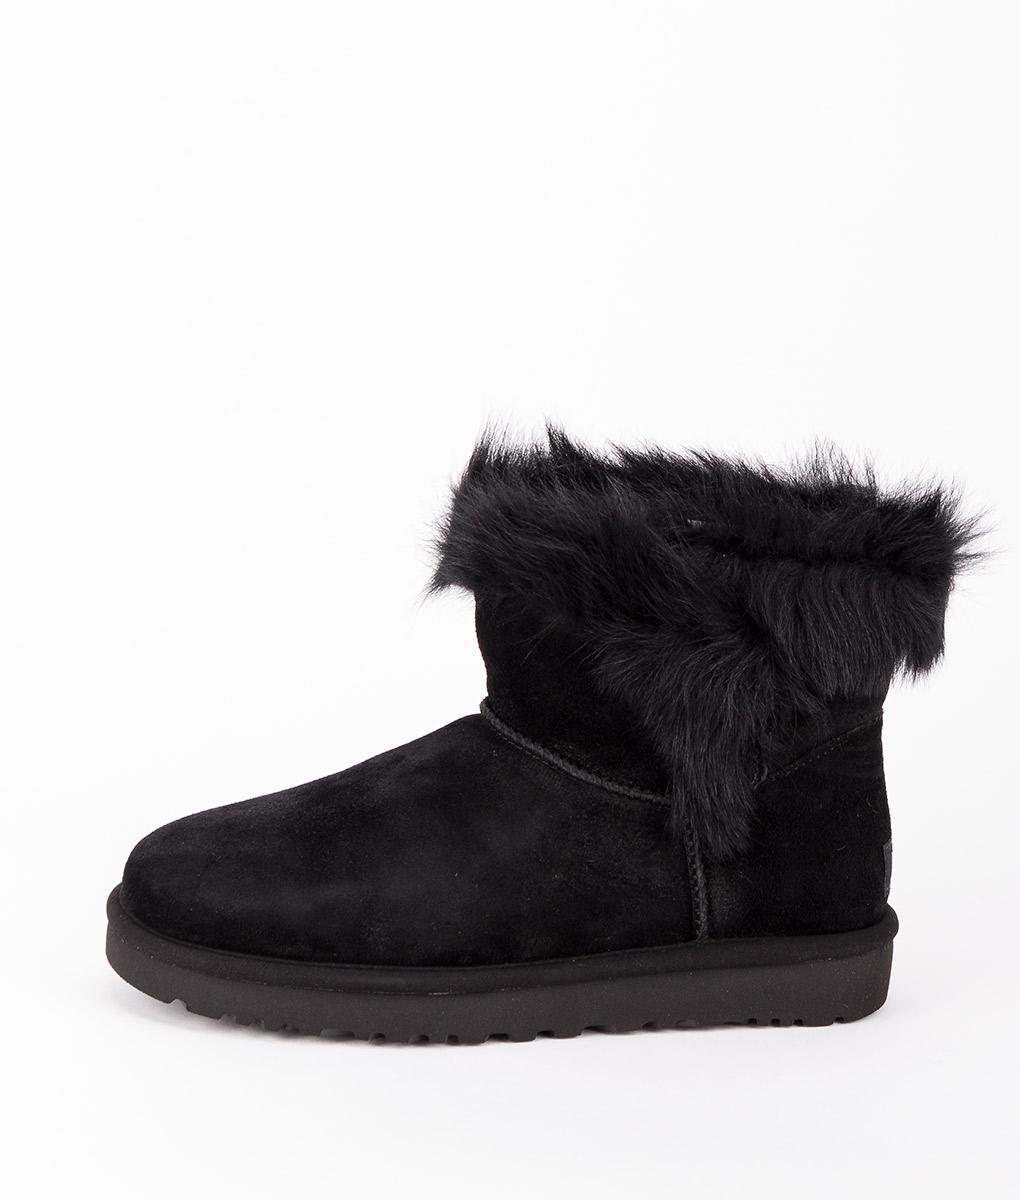 UGG Women Ankle Boots 1018303 MILA, Black 269.99